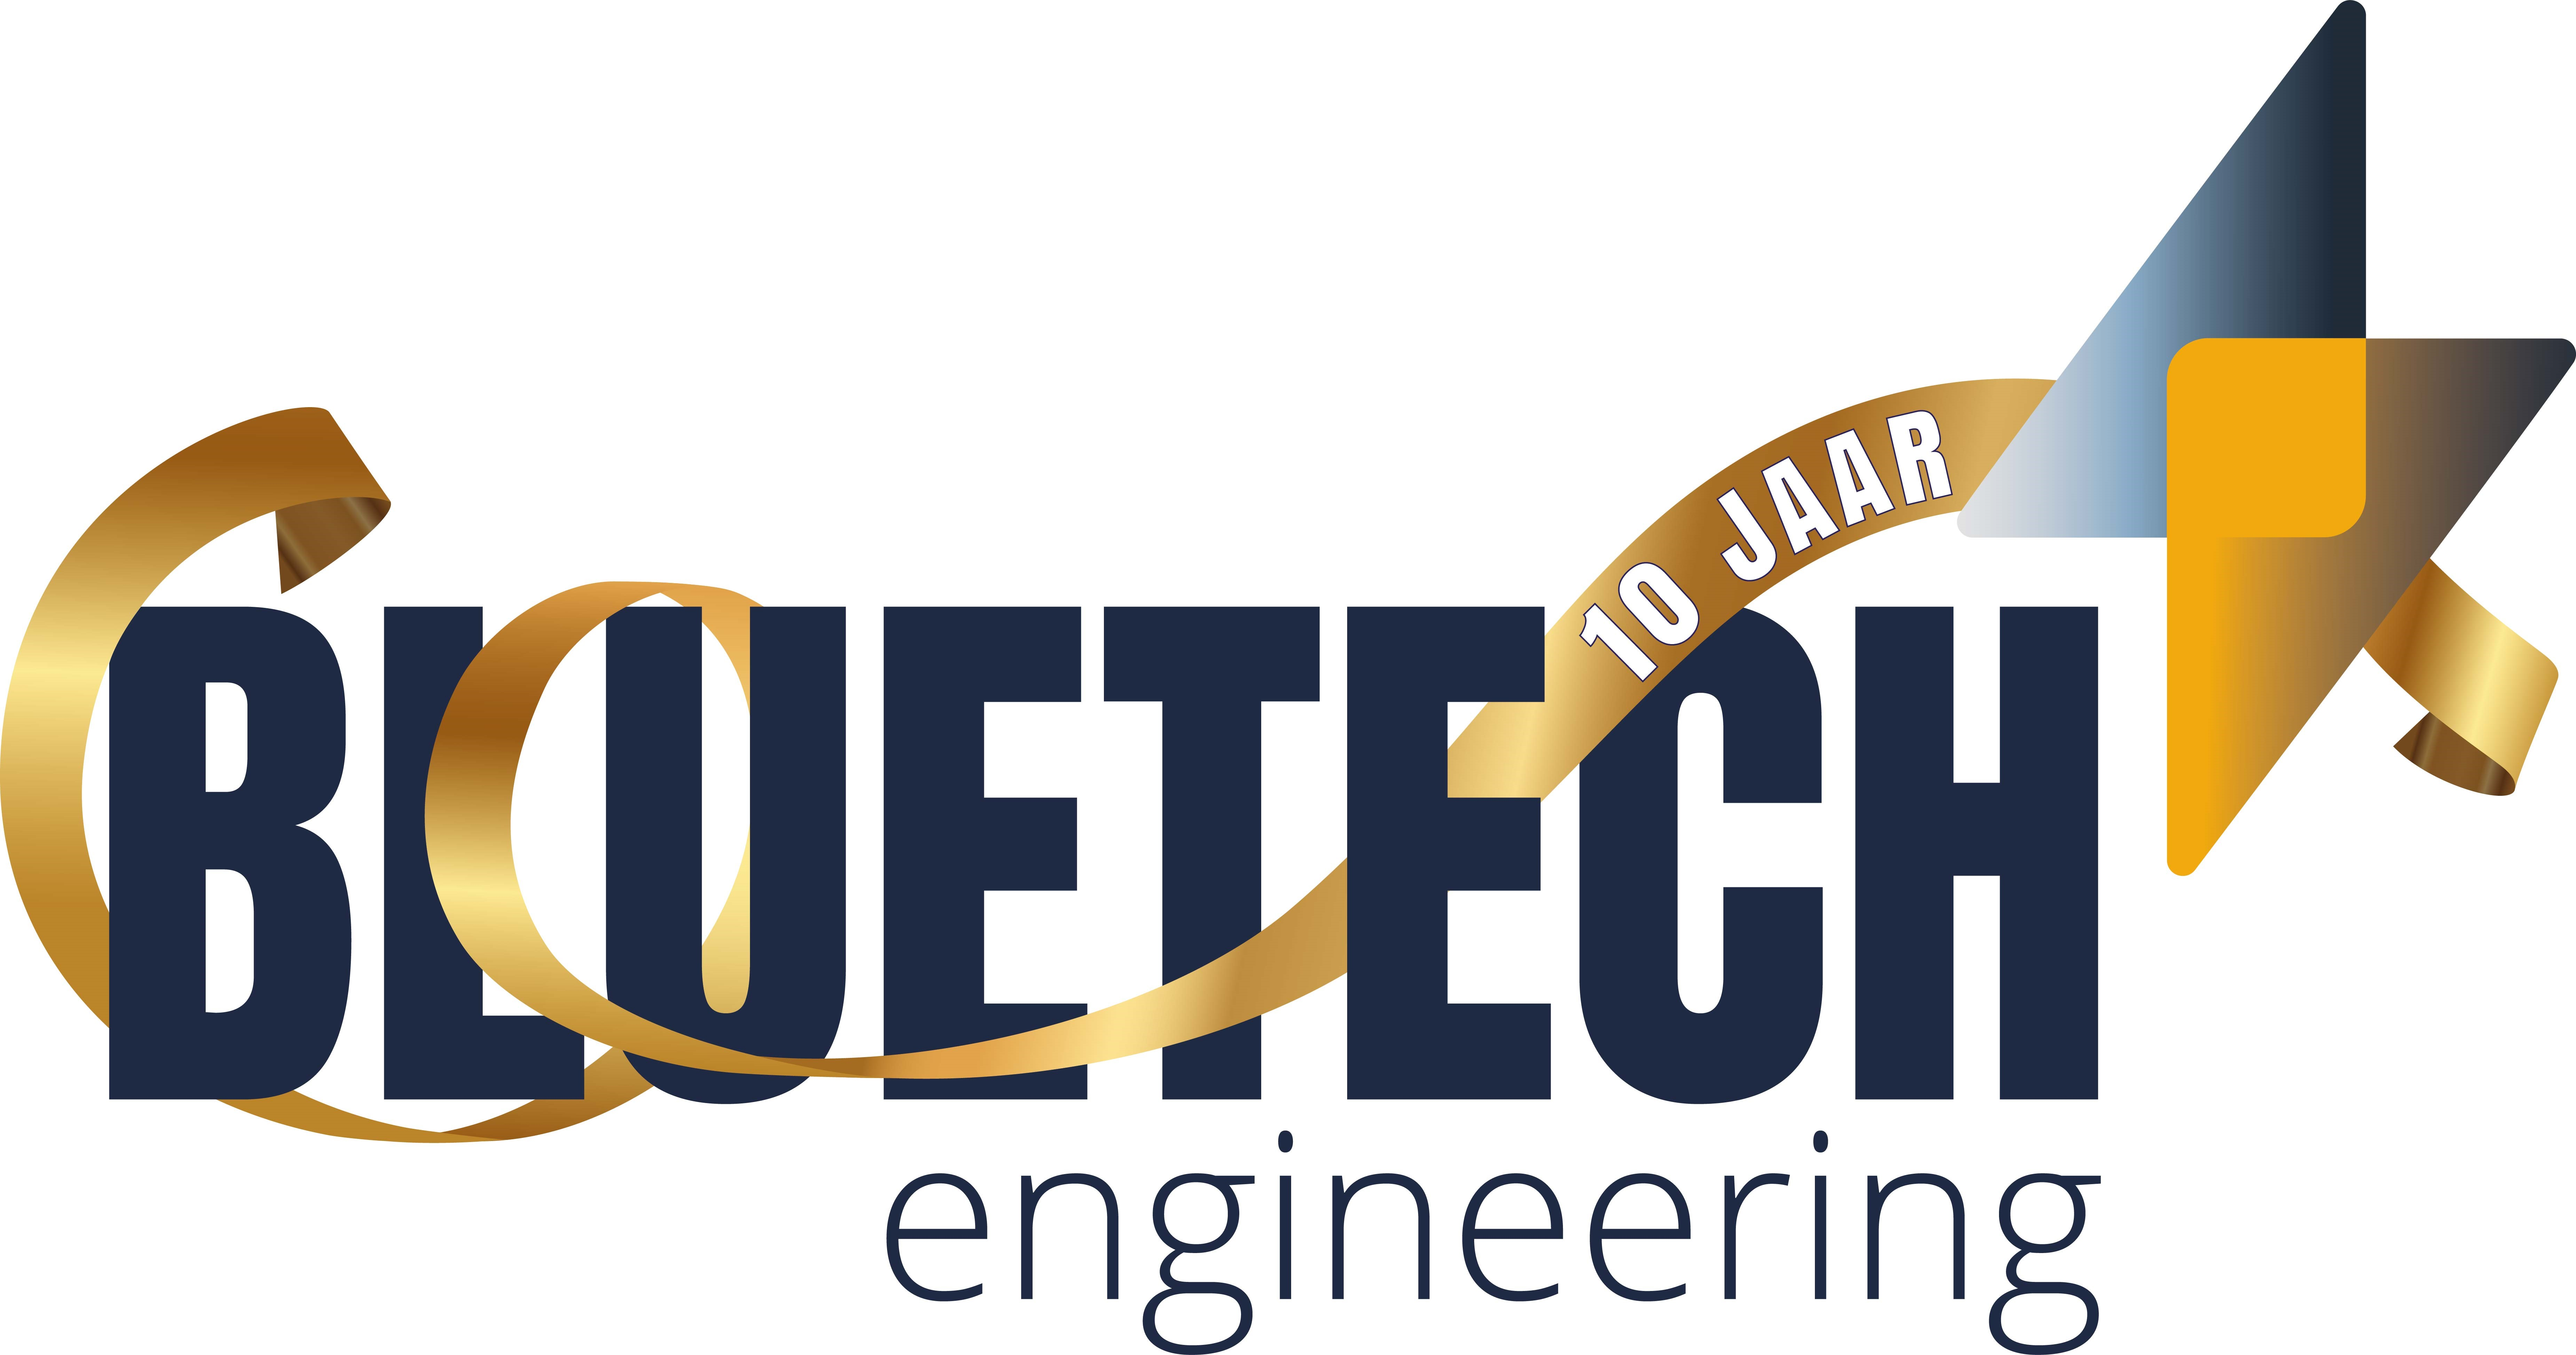 Bluetech Engineering, 10 jaar